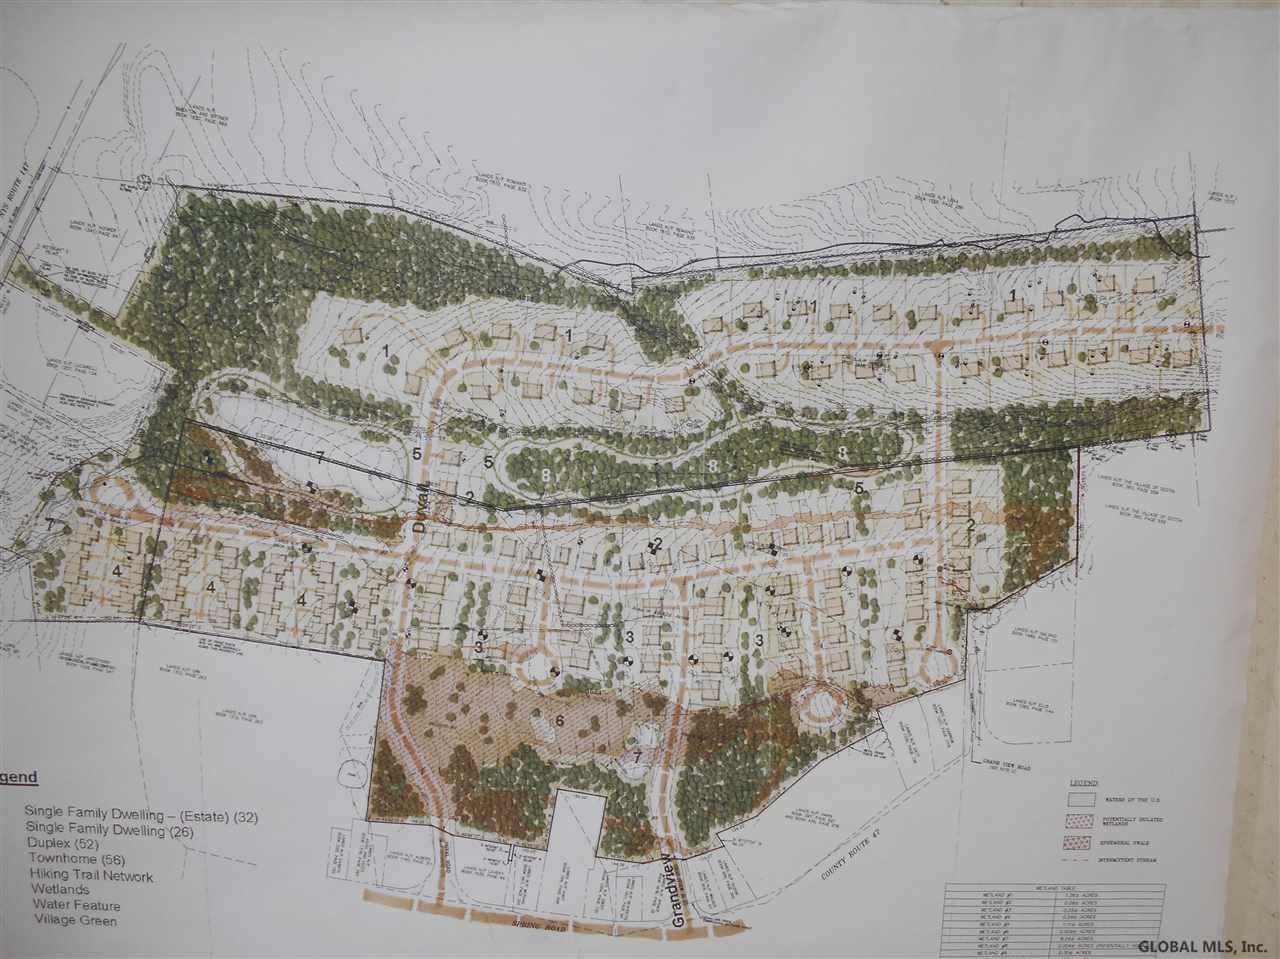 Glenville image 1